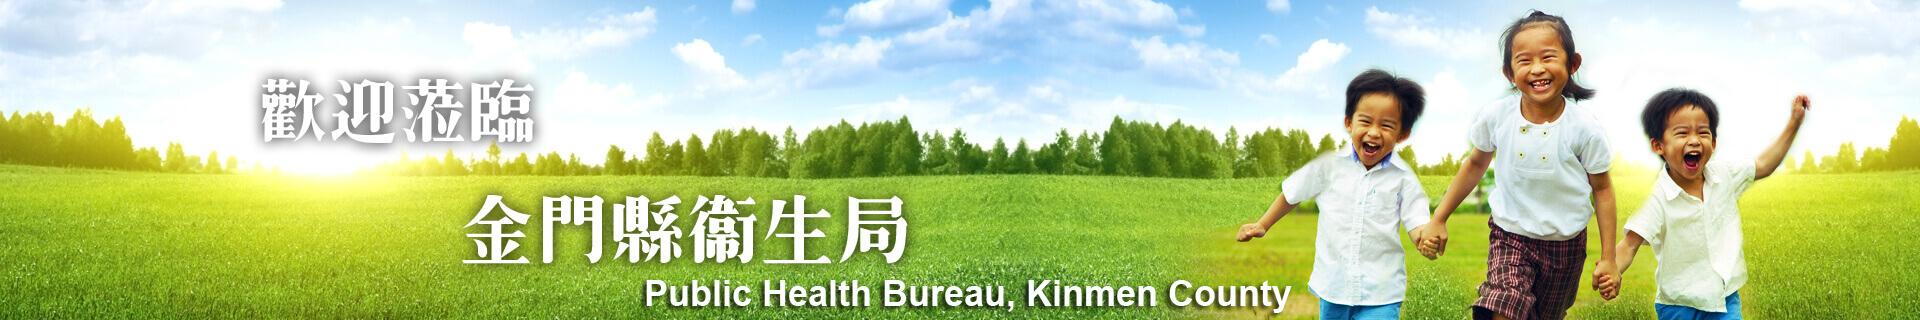 Welcome to the Health Bureau of  Kinmen County